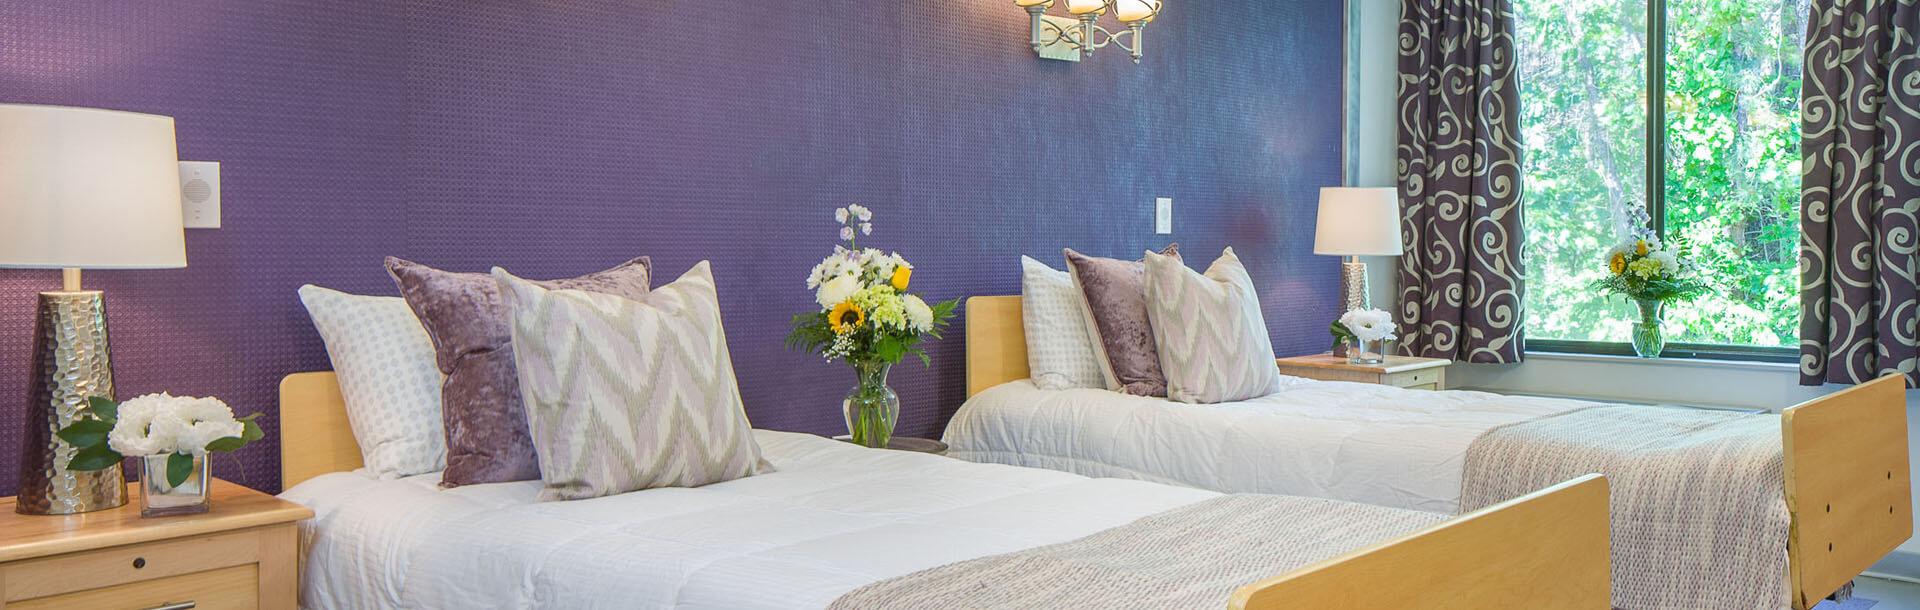 Bedroom at Oasis Rehab